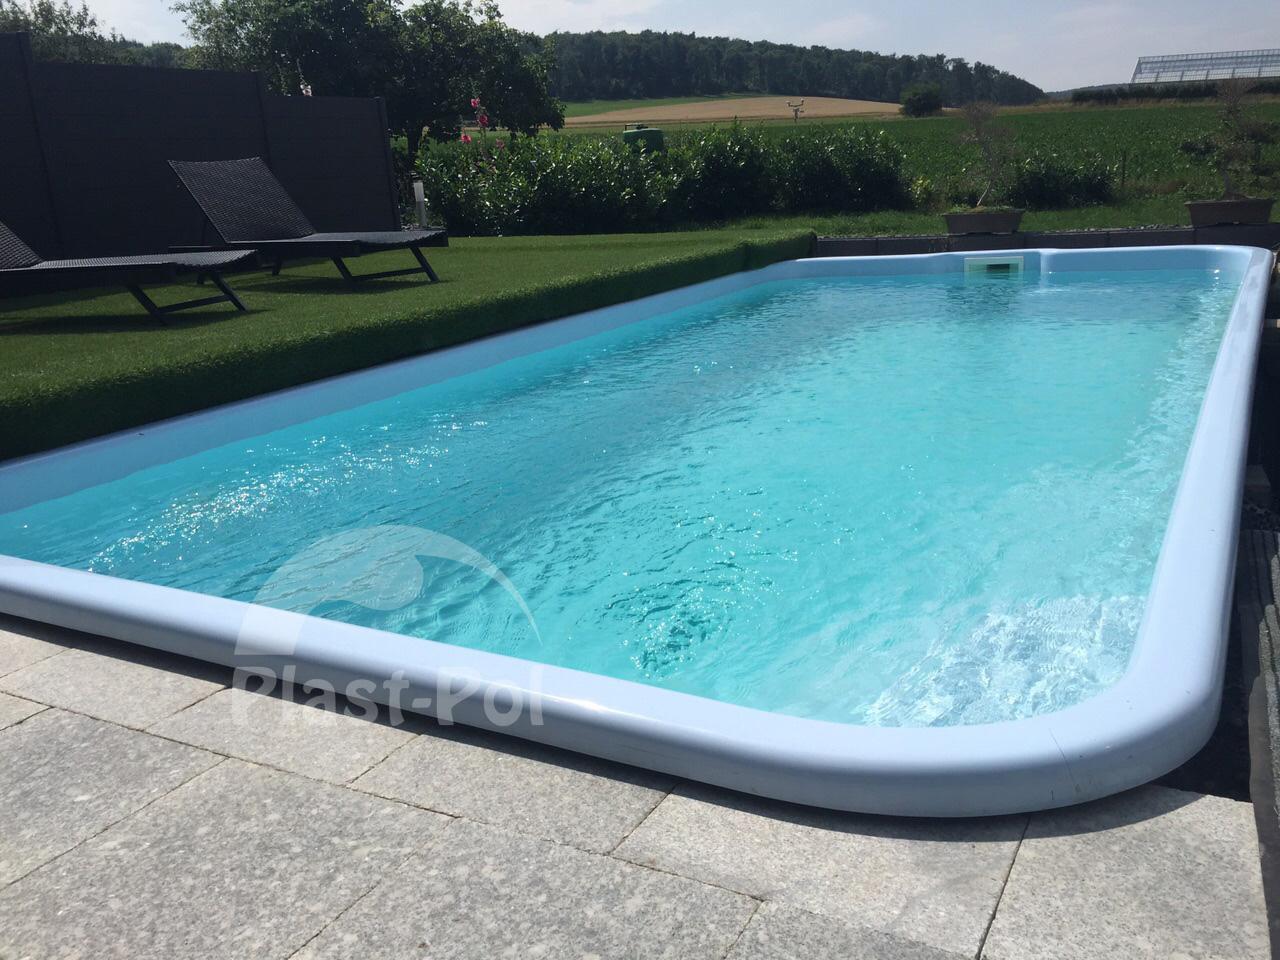 Gfk schwimmbecken swimming pool 6 2x3 0 fertigbecken for Swimming pool ausverkauf